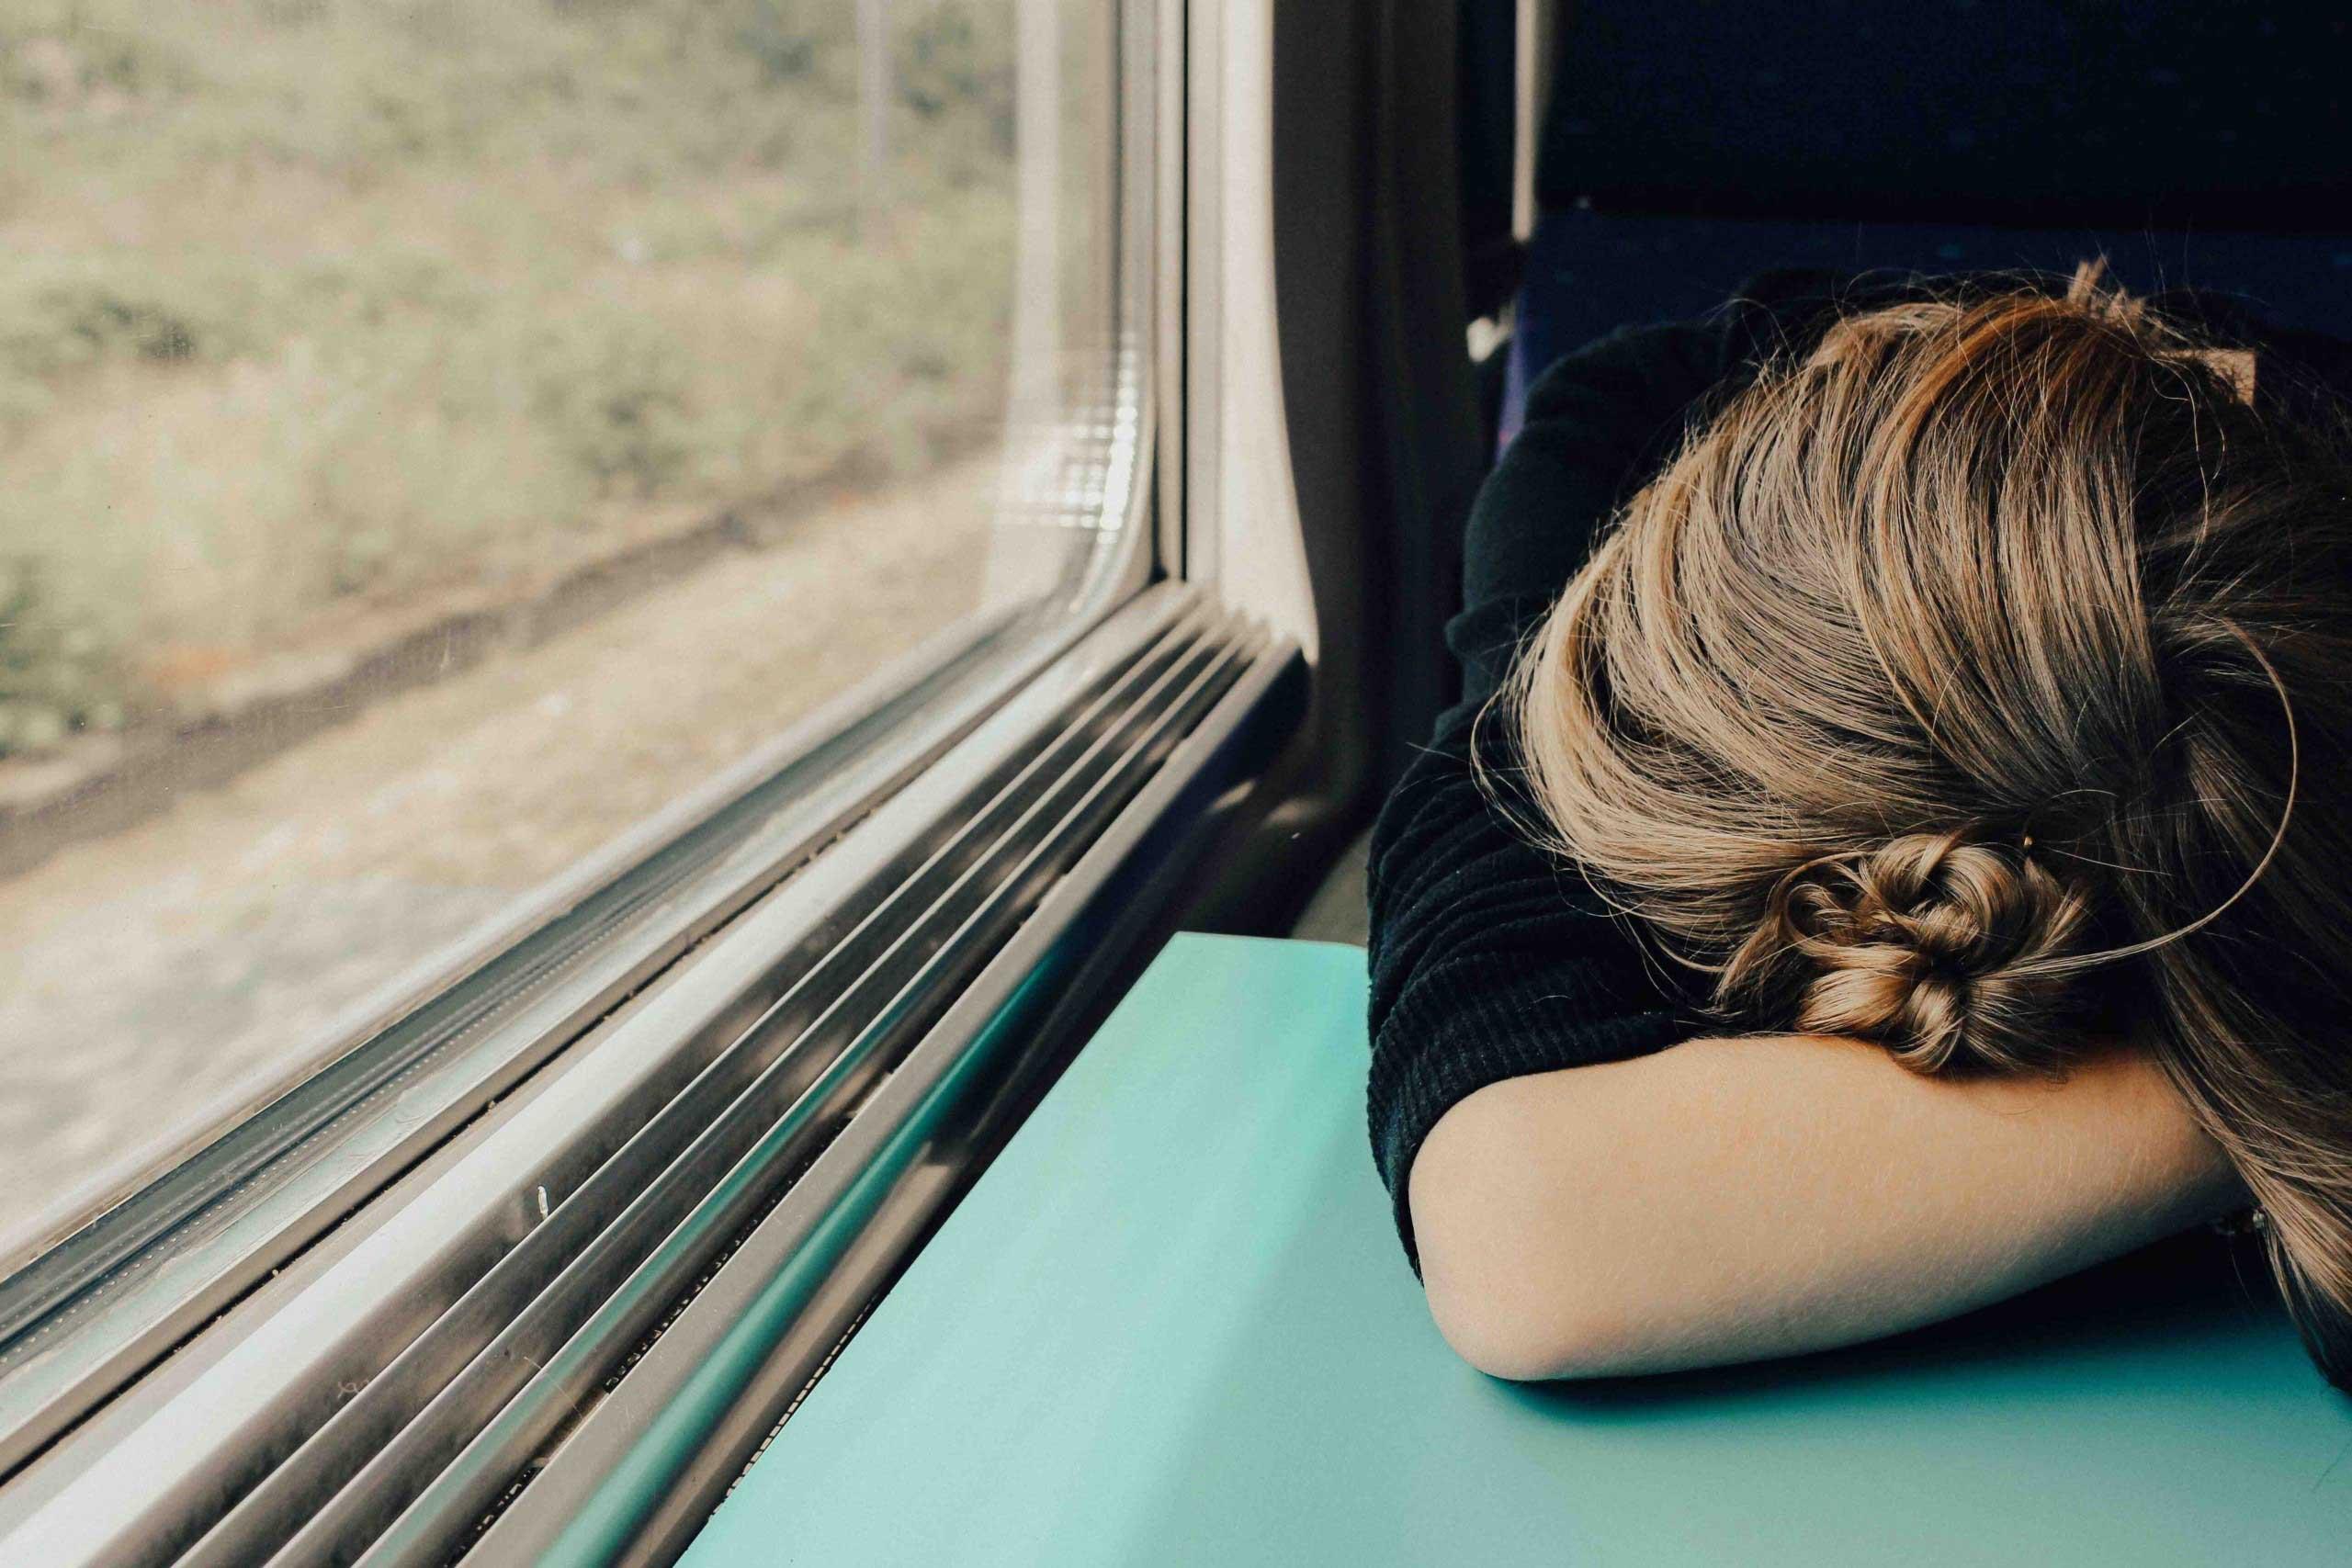 Woman sleeping on the train